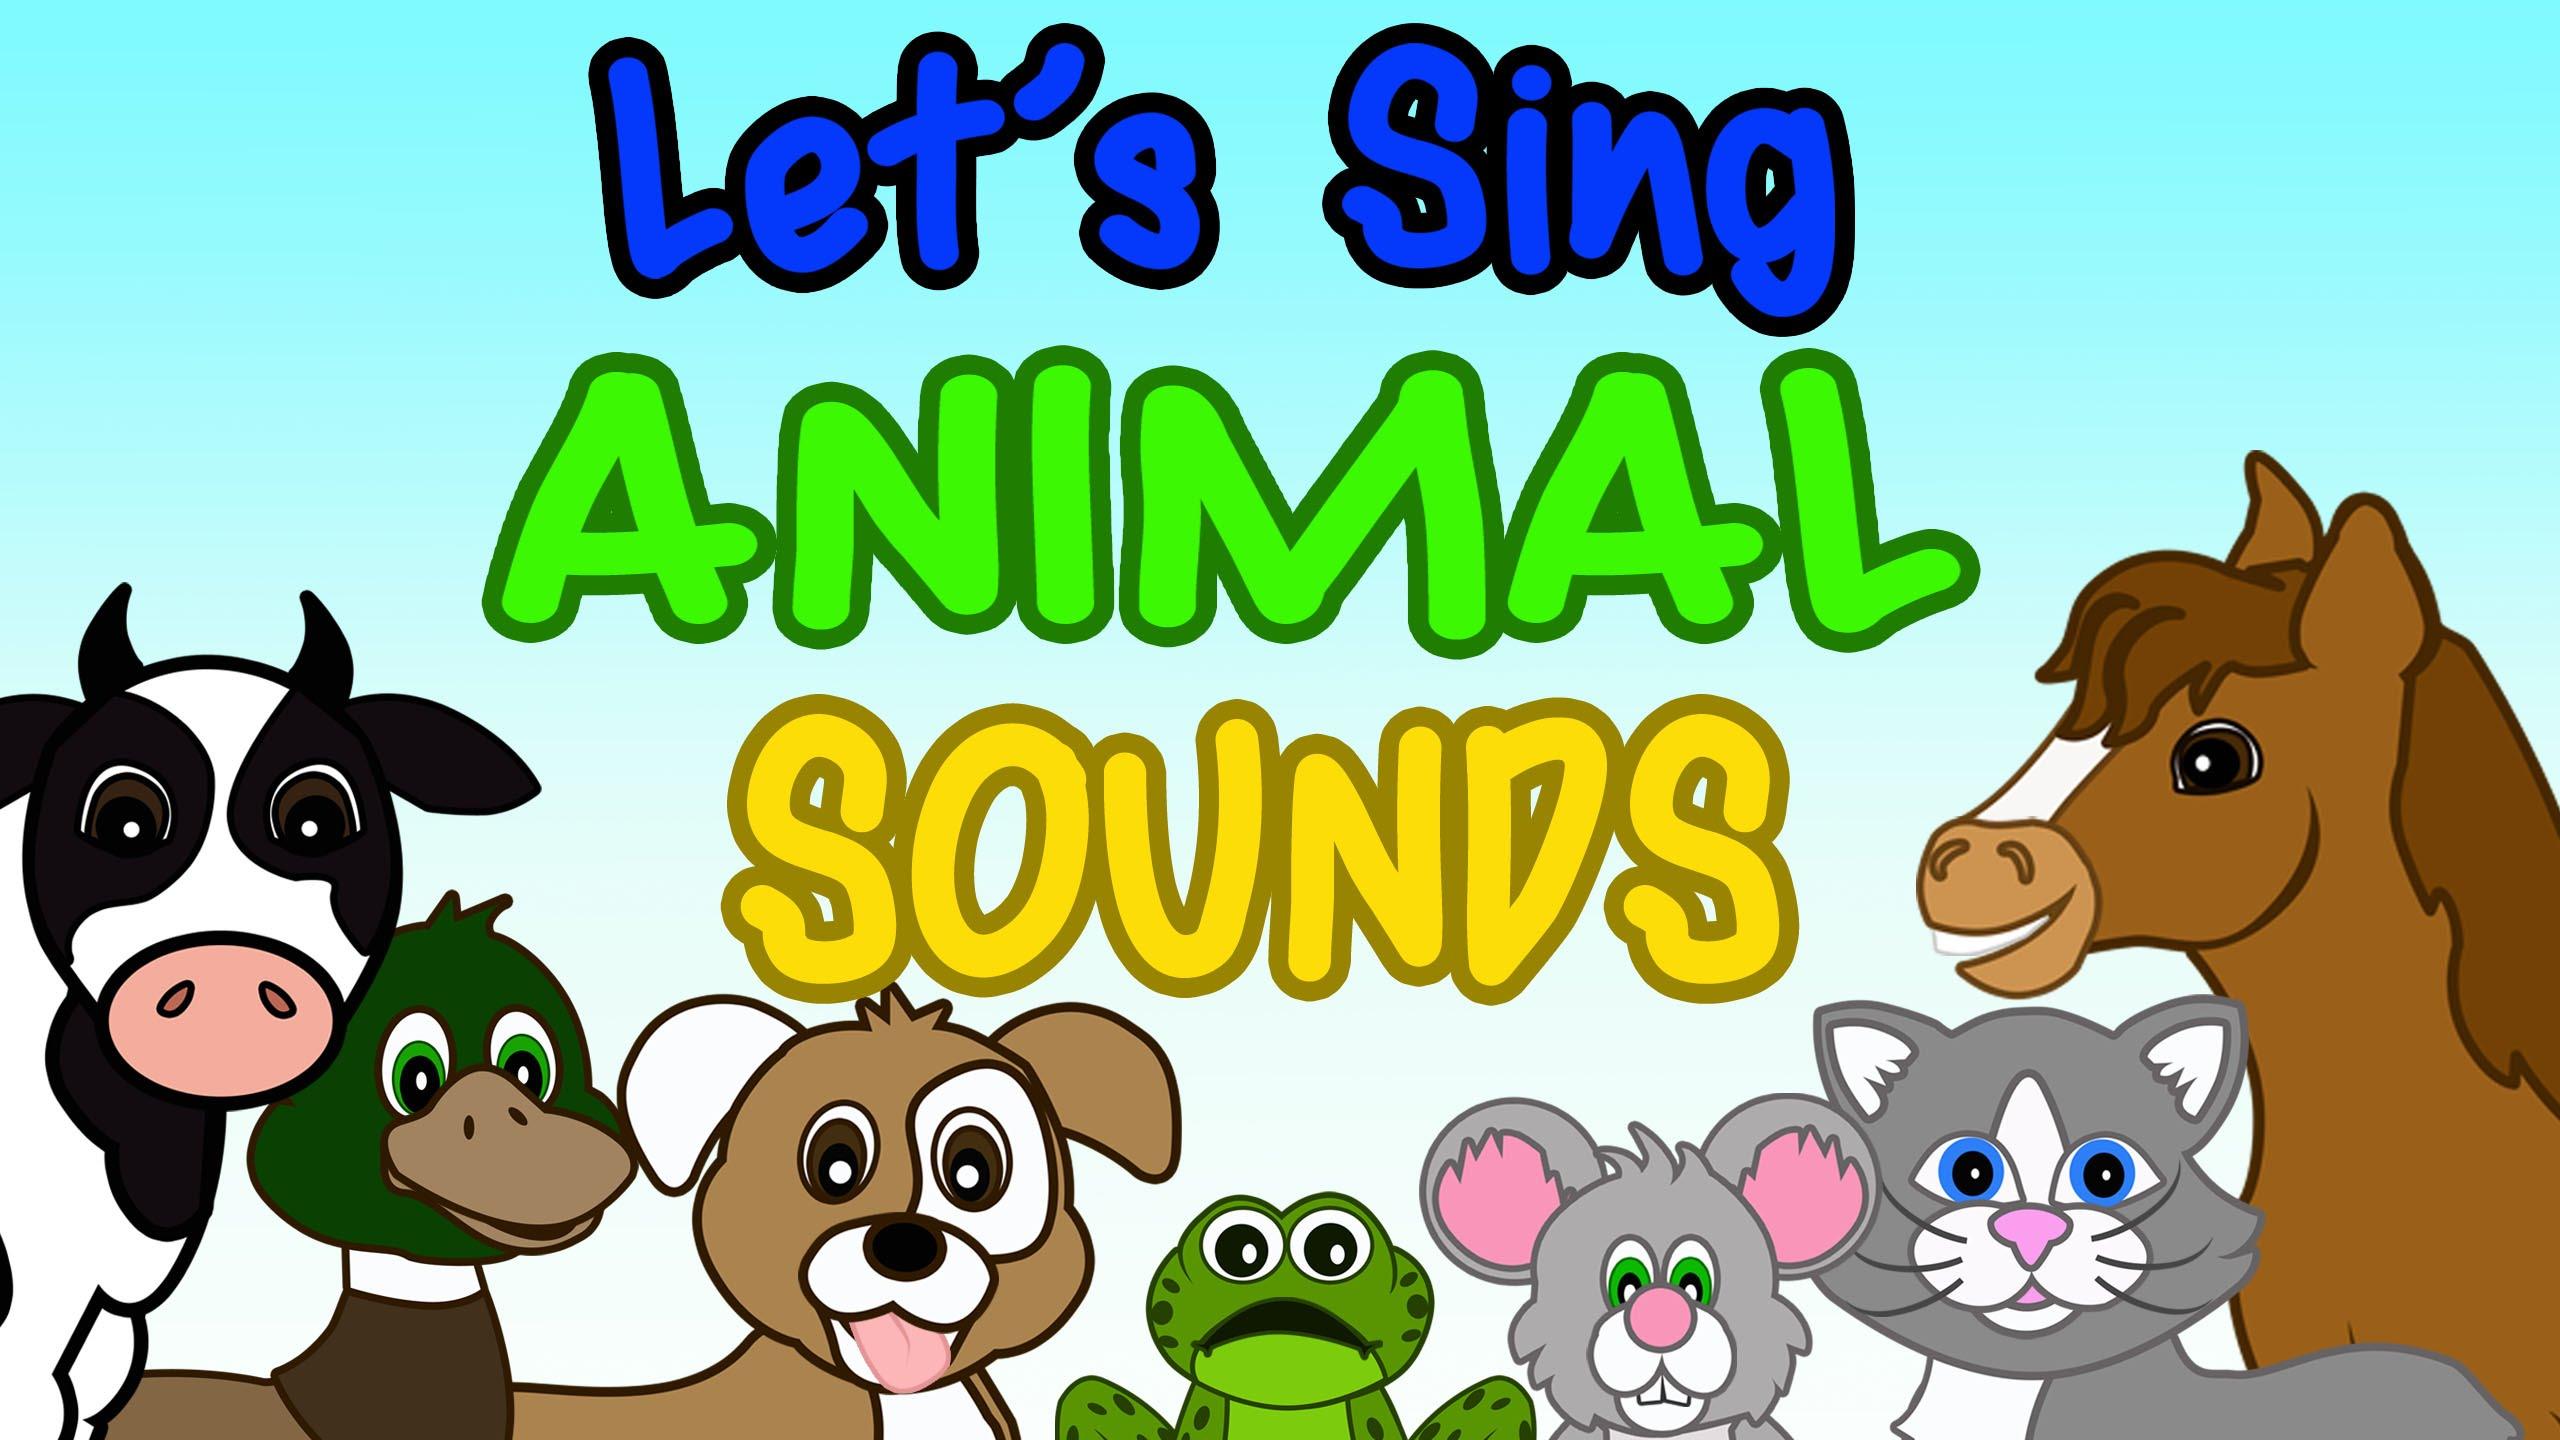 Saying clipart animal sounds #10